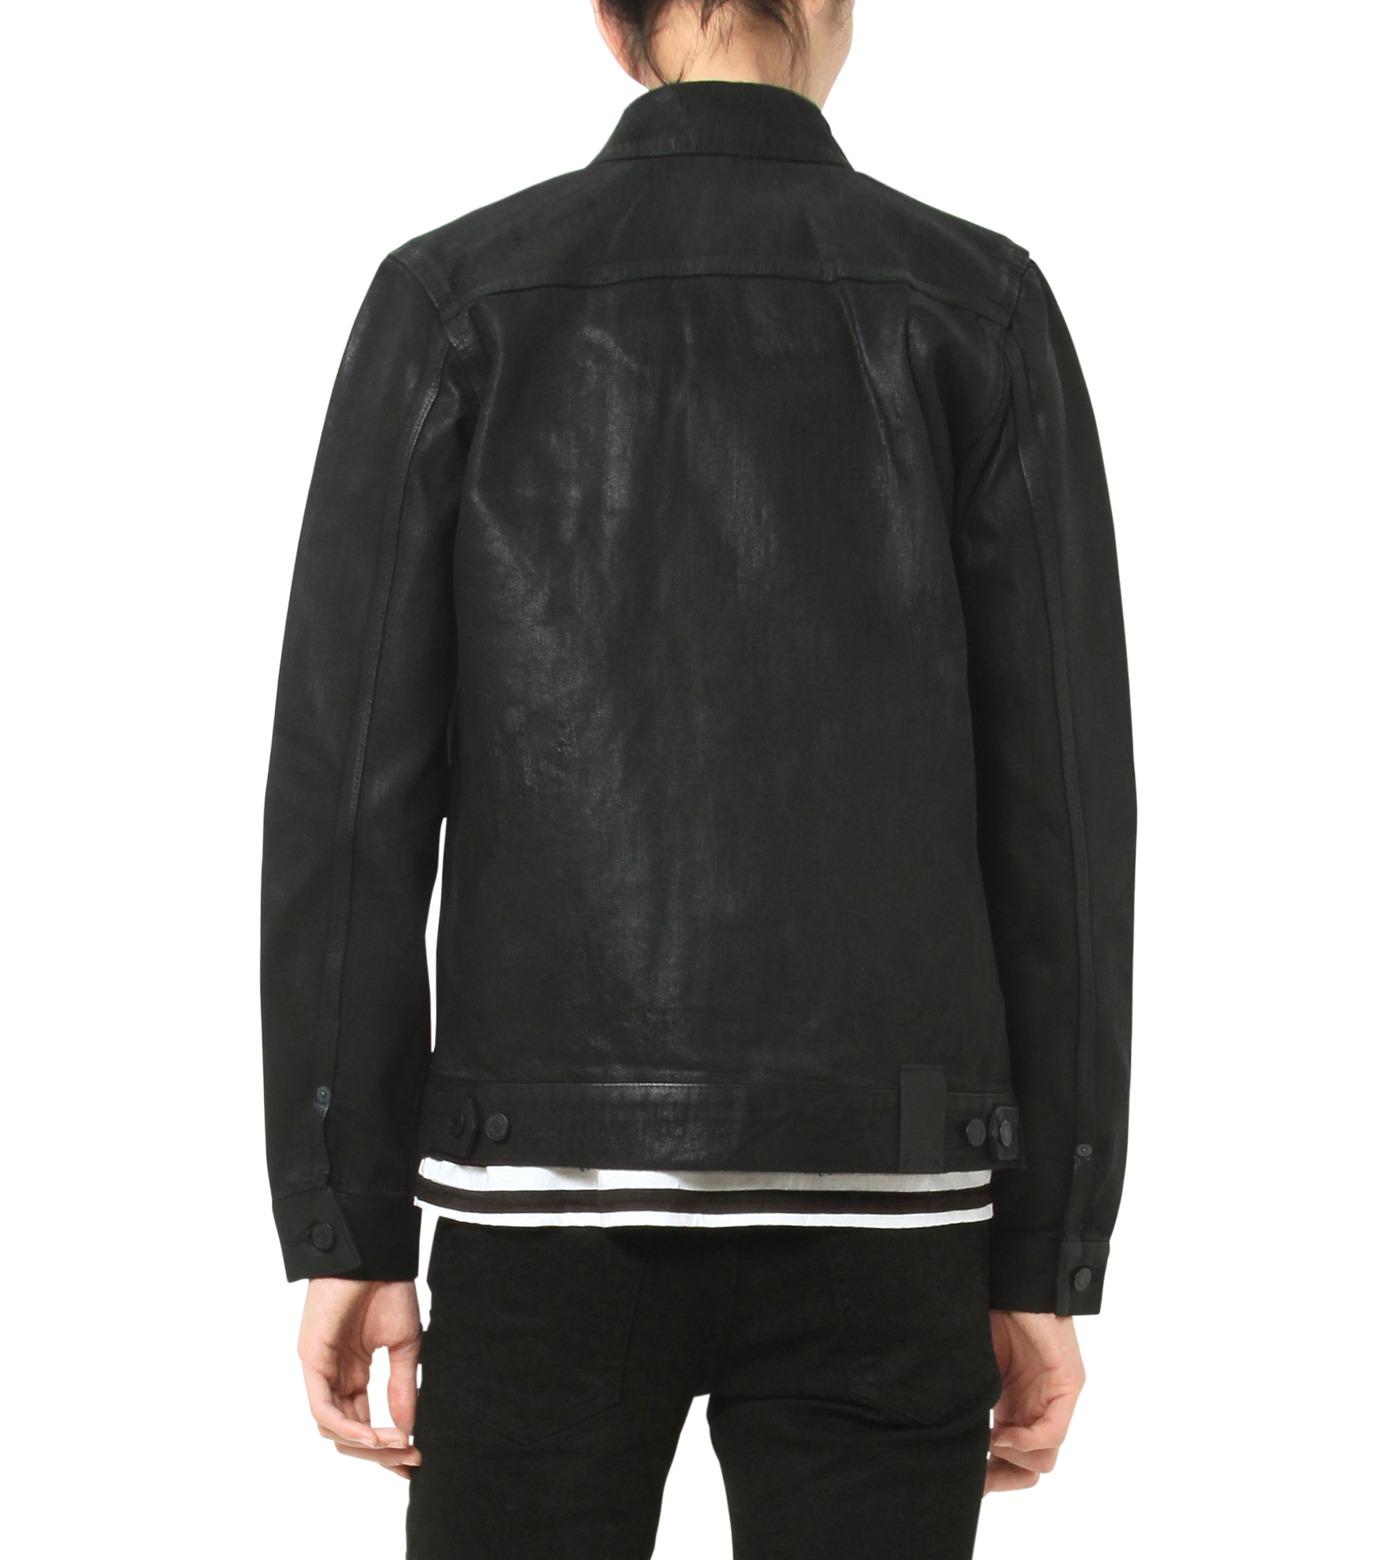 HL HEDDIE LOVU(エイチエル・エディールーヴ)のCOATING BLACK DENIM JACKET-BLACK(ジャケット/jacket)-17A94001-13 拡大詳細画像6